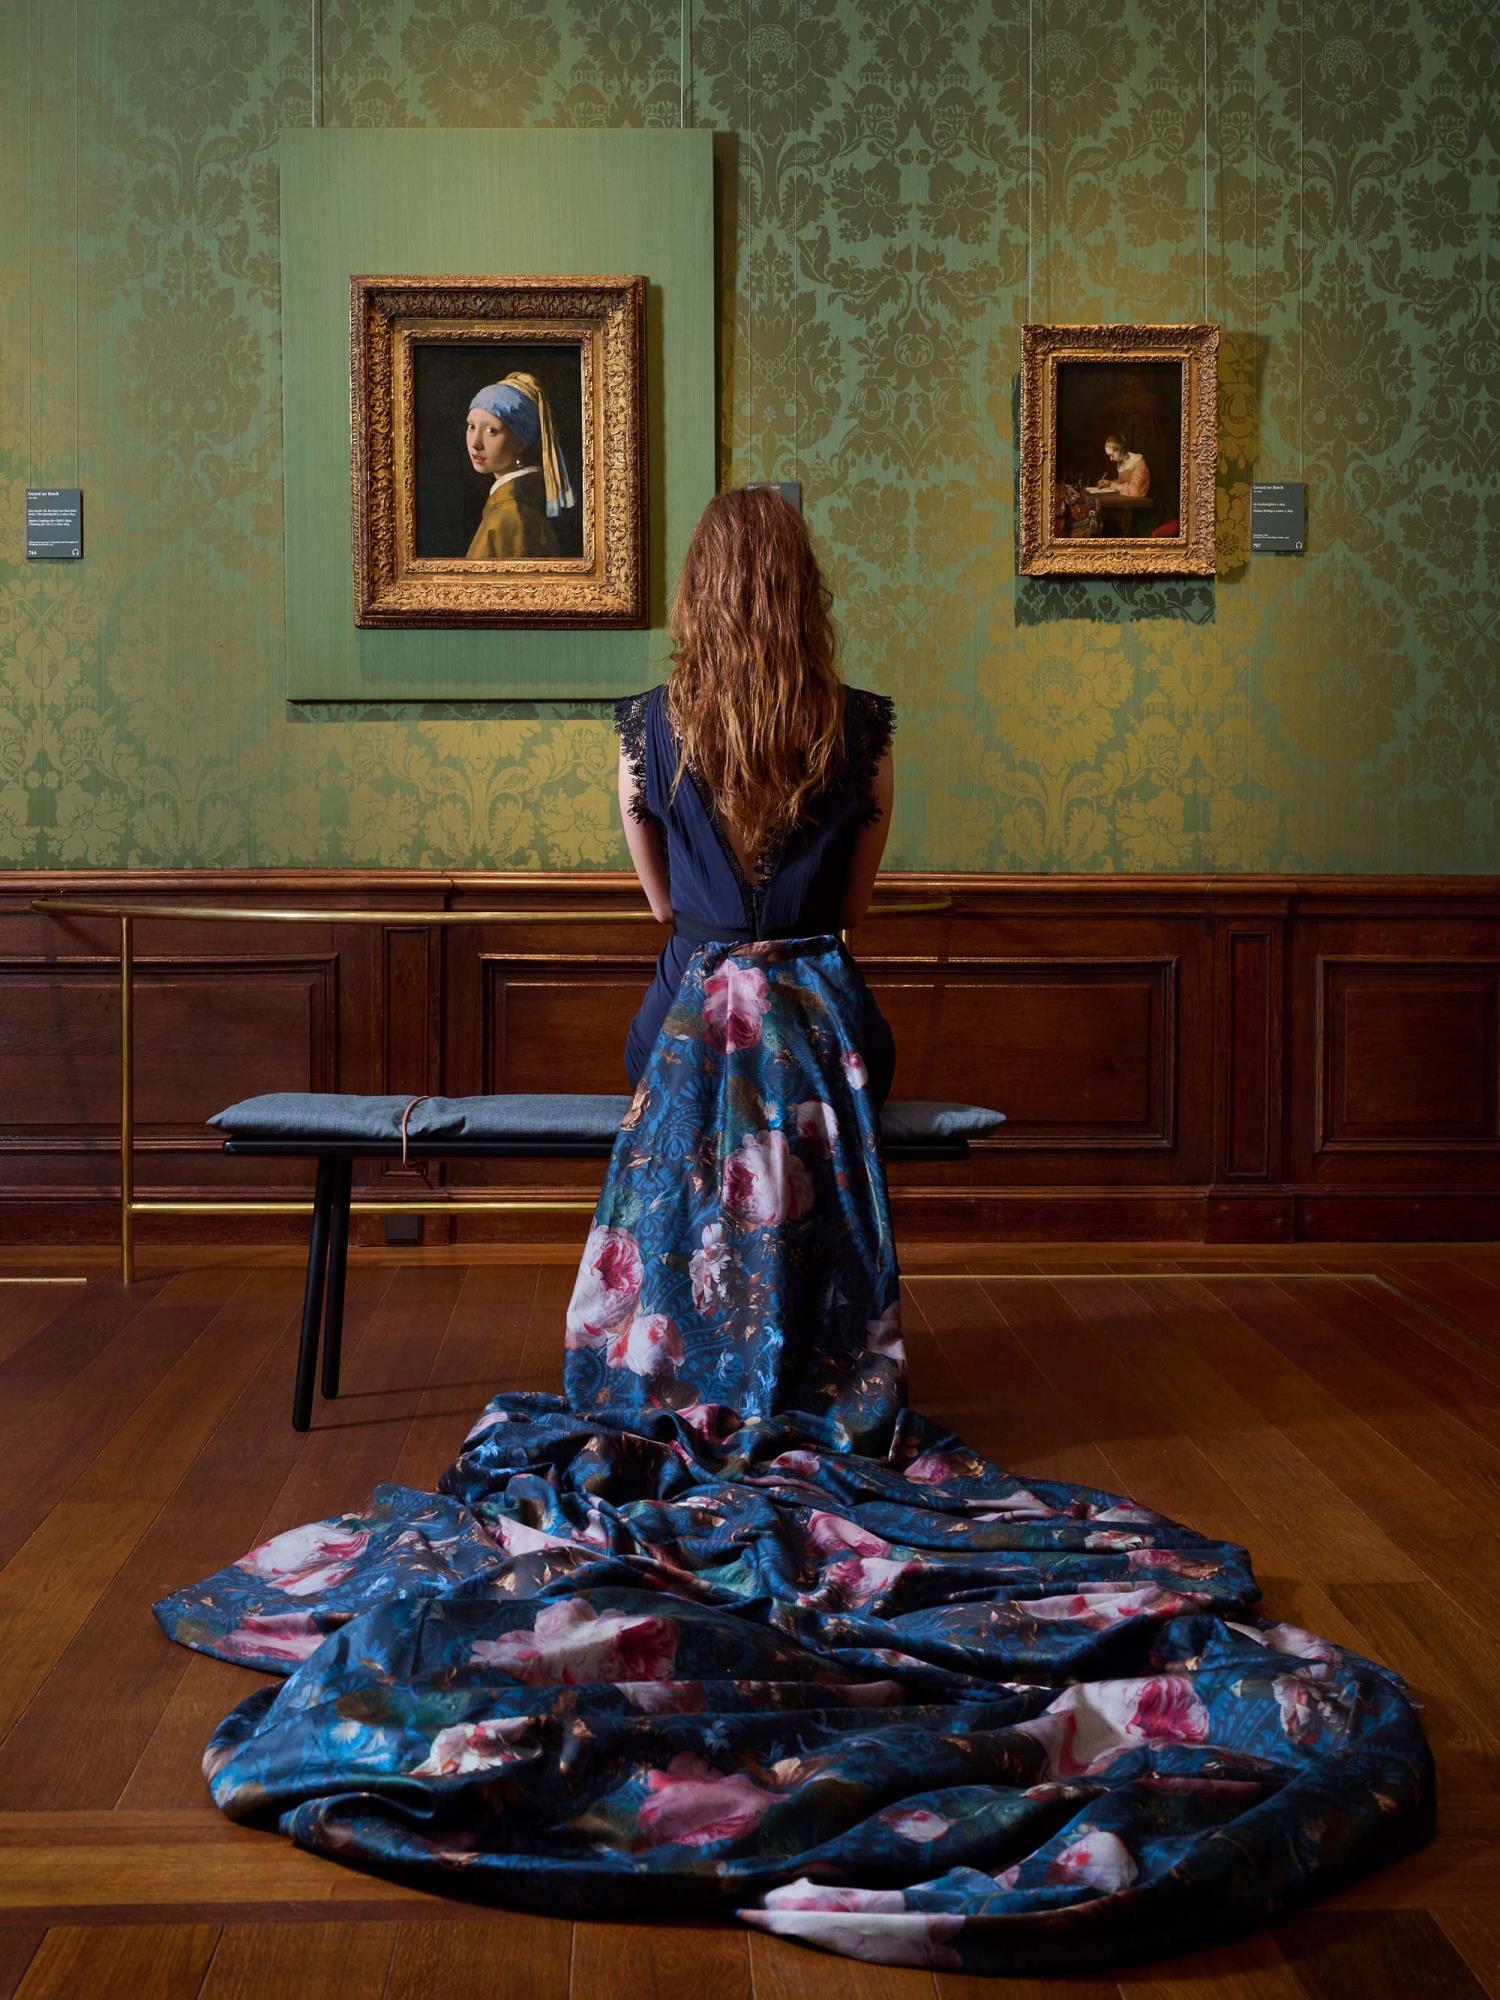 ESSENZA Gallery of Roses Nightblue Dekbedovertrekset 240 x 220 cm